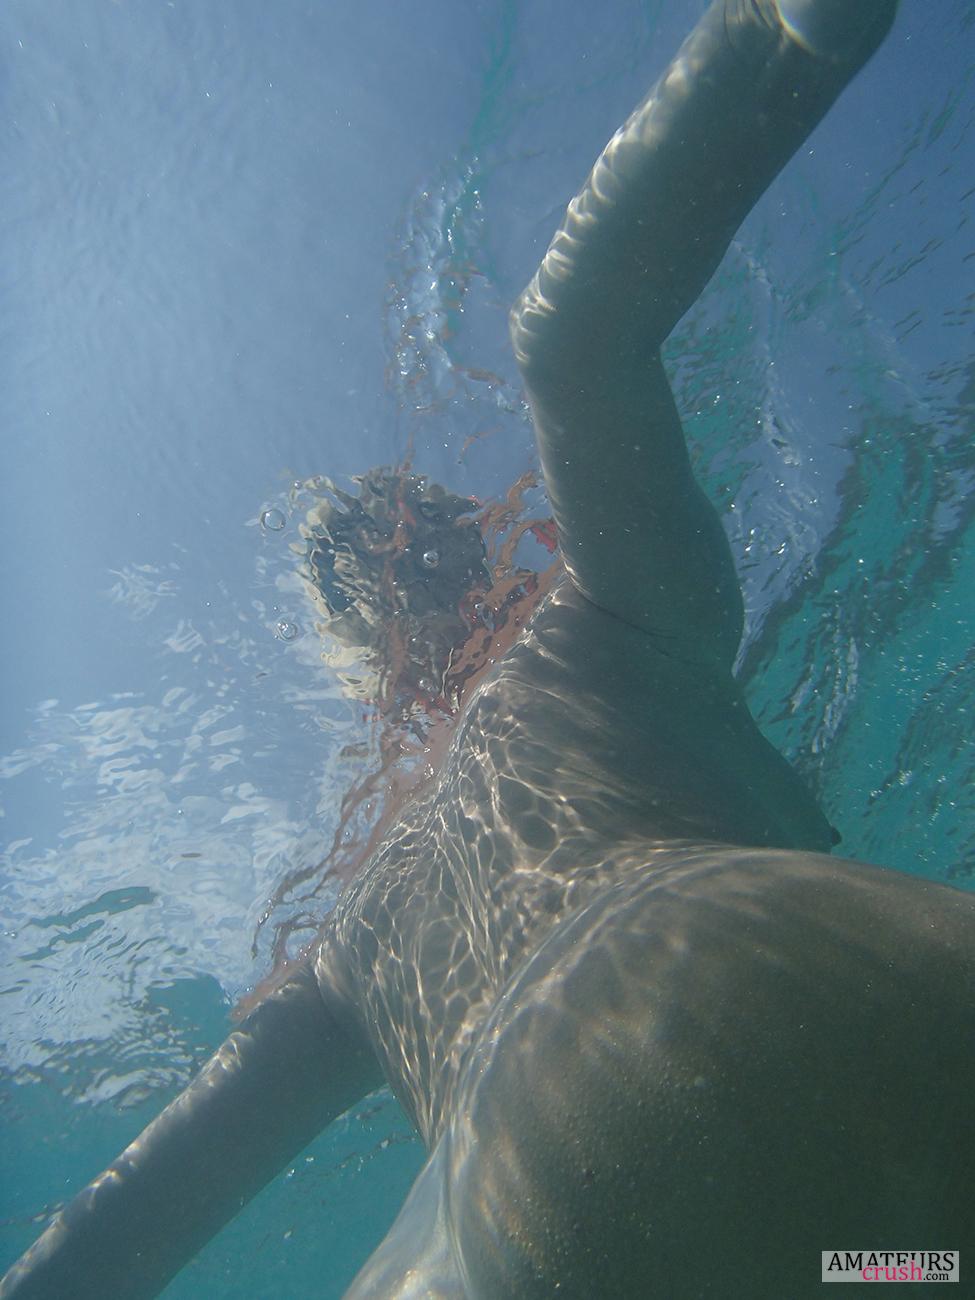 Underwater nude swimming